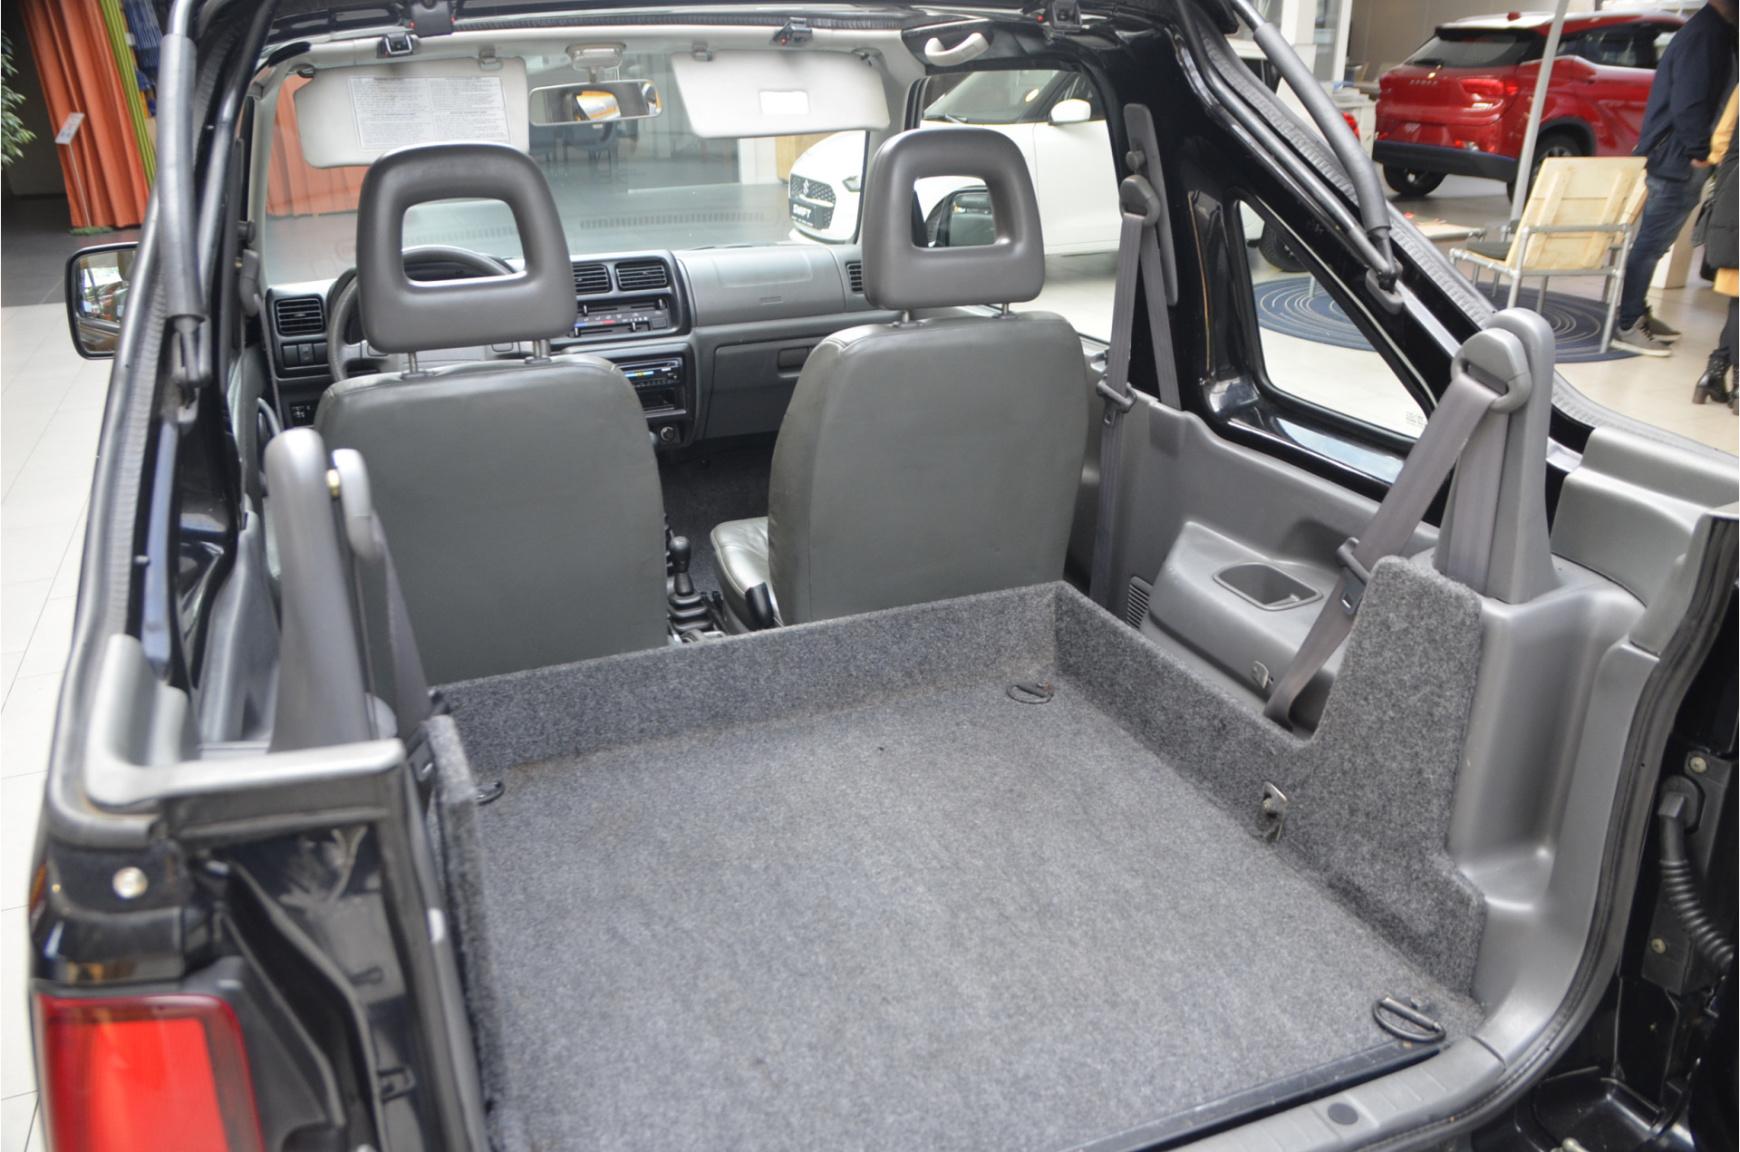 Suzuki-Jimny-13